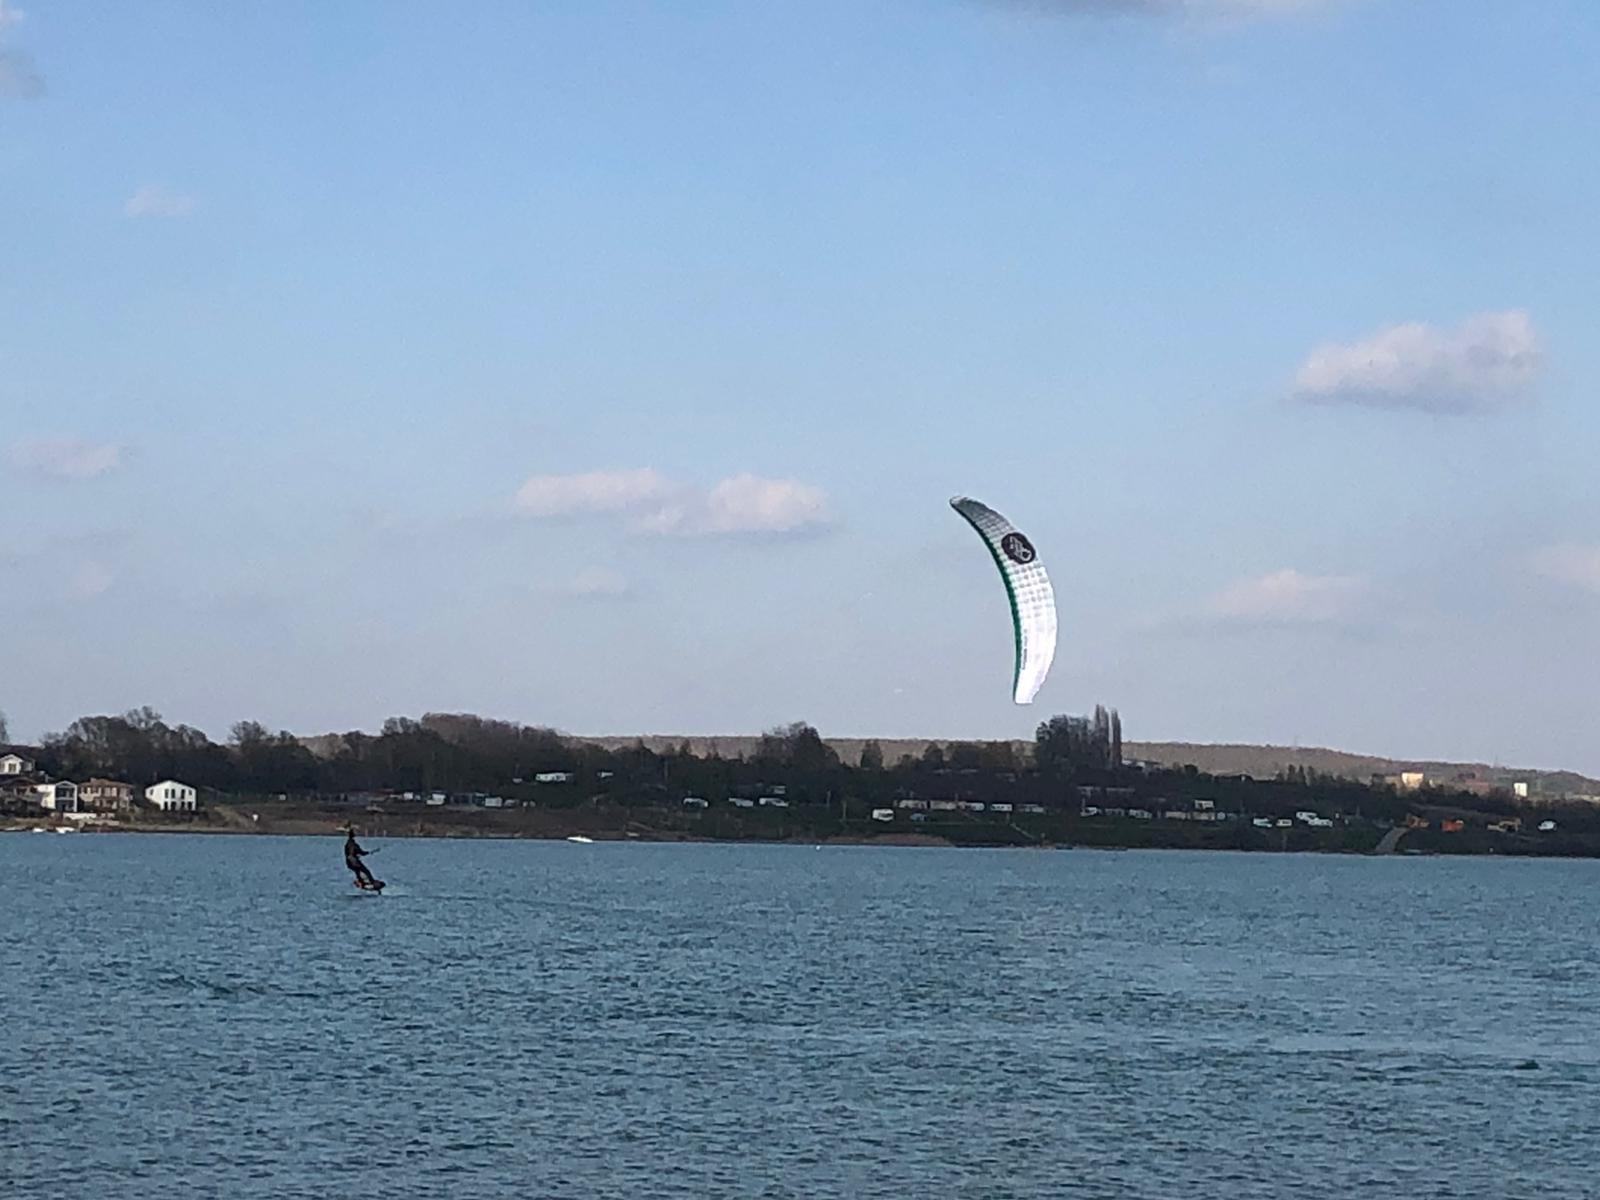 Hydrofoil Kite Kurs